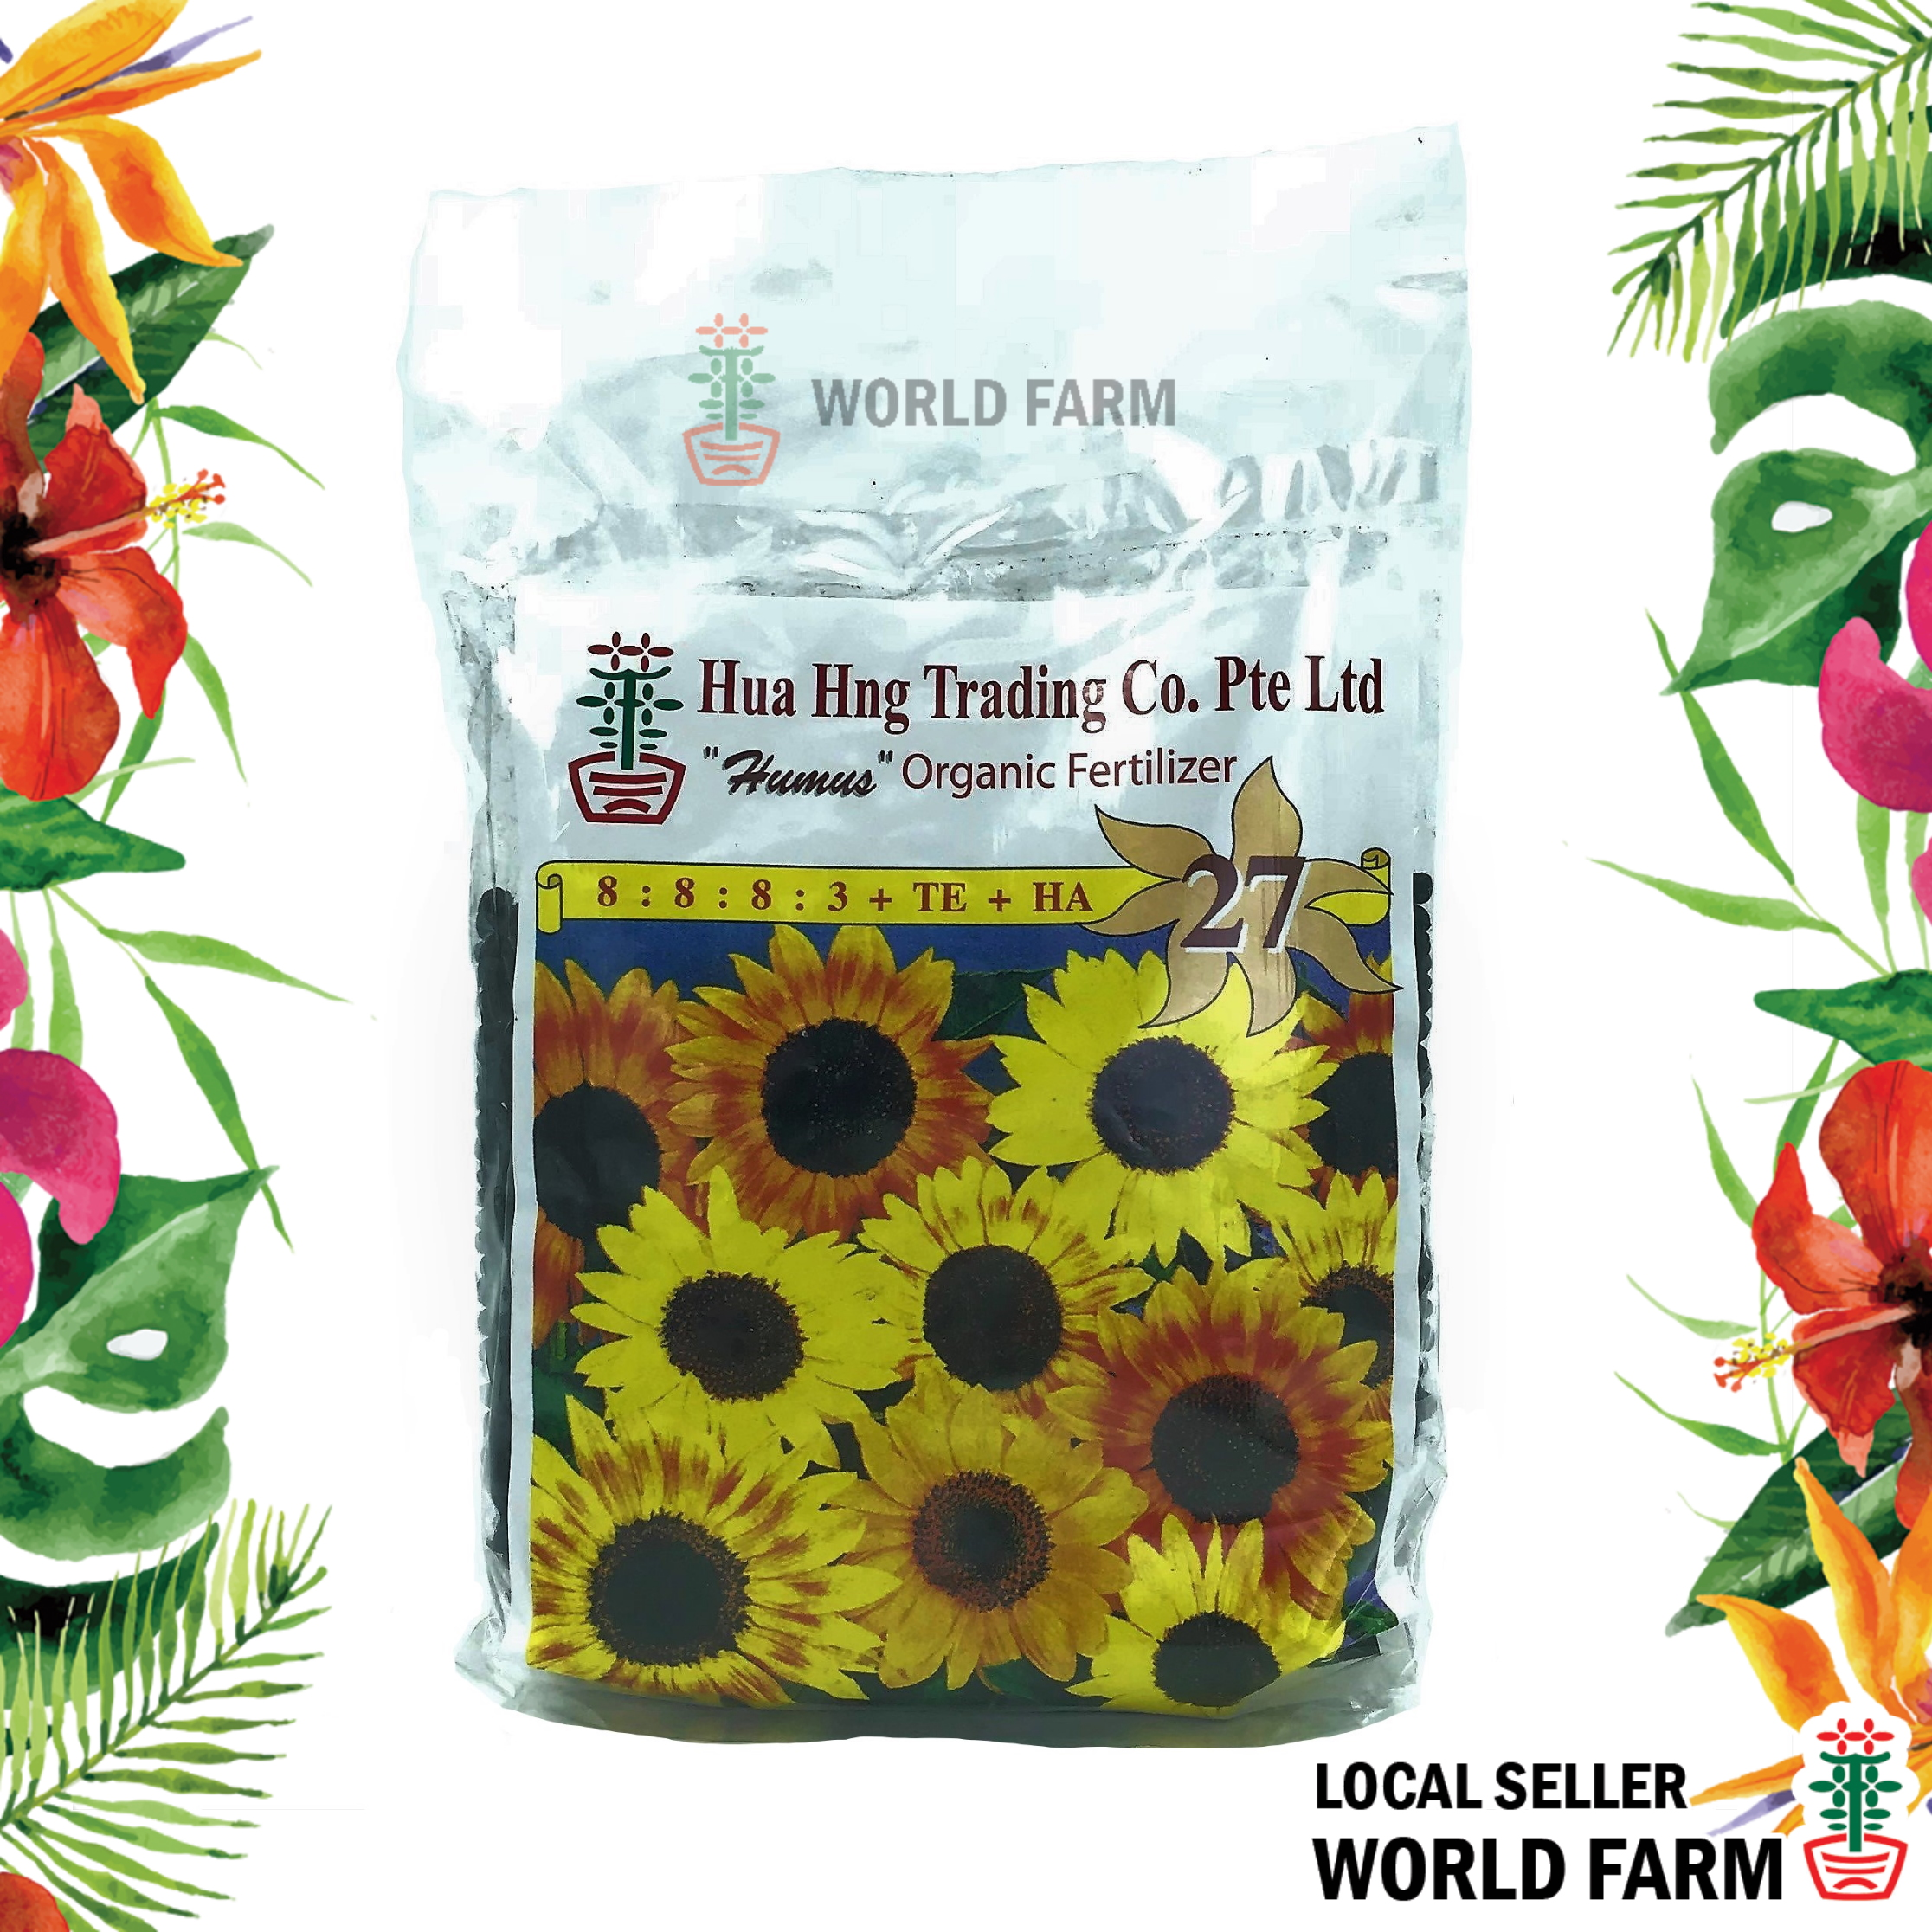 NPK 27 Humus Organic Fertiliser / Fertilizer for Overall Growth Granular 400g